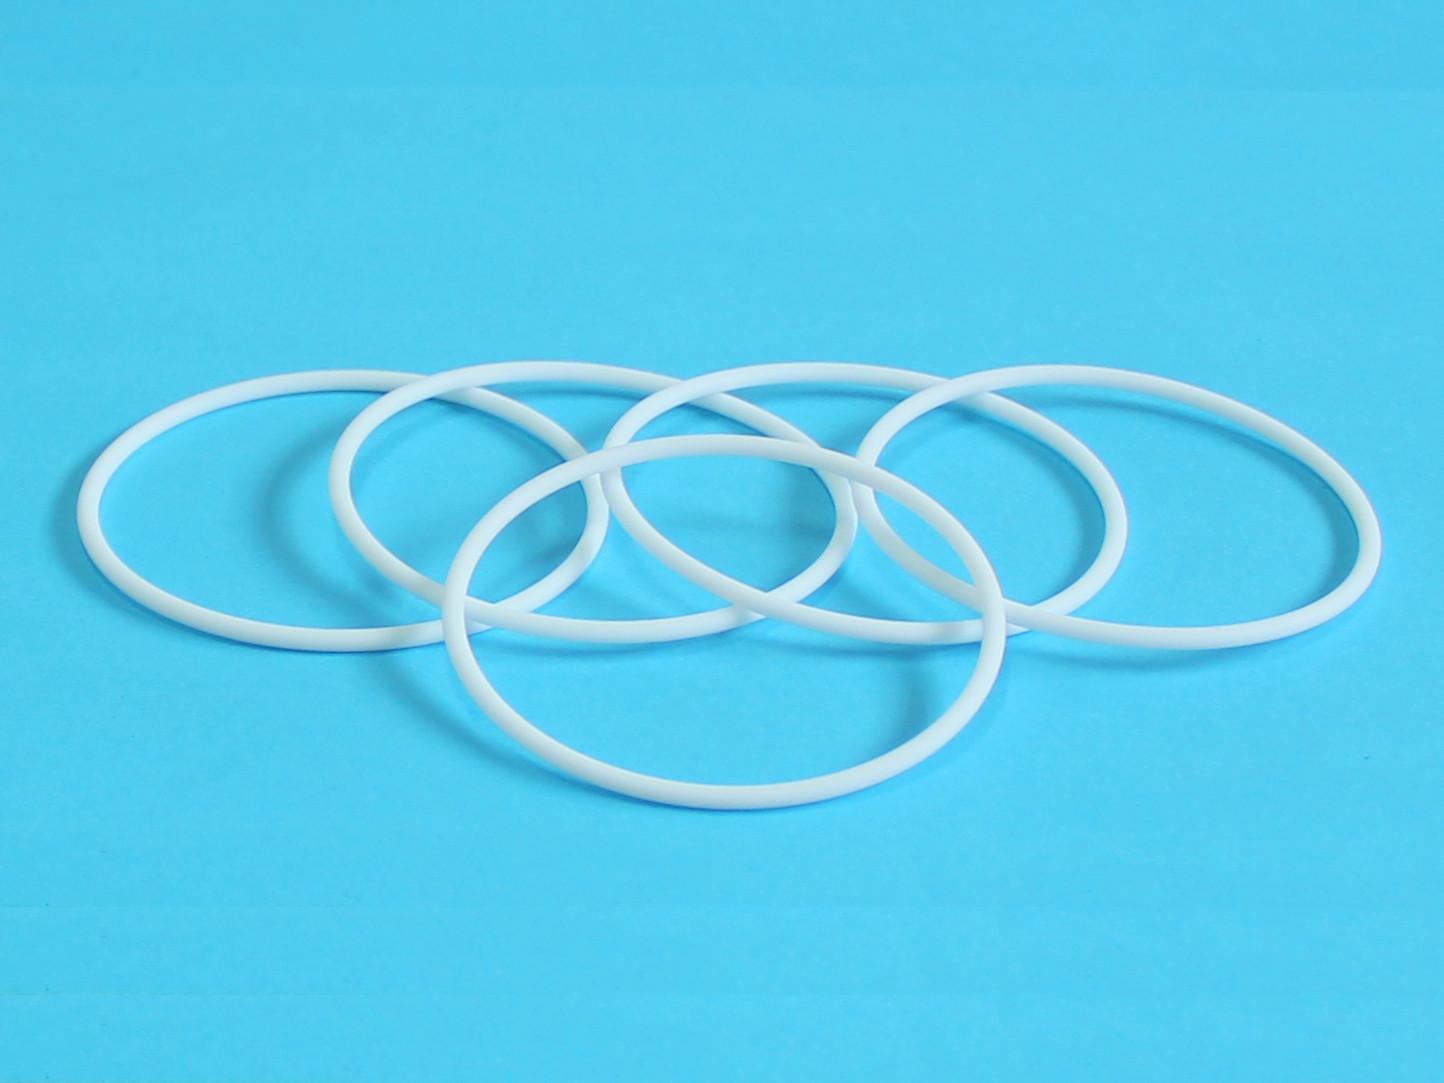 DSH-Piston Seal Catalogue | O Ring Nbr Fkm Silicone Rubber Ptfe-1